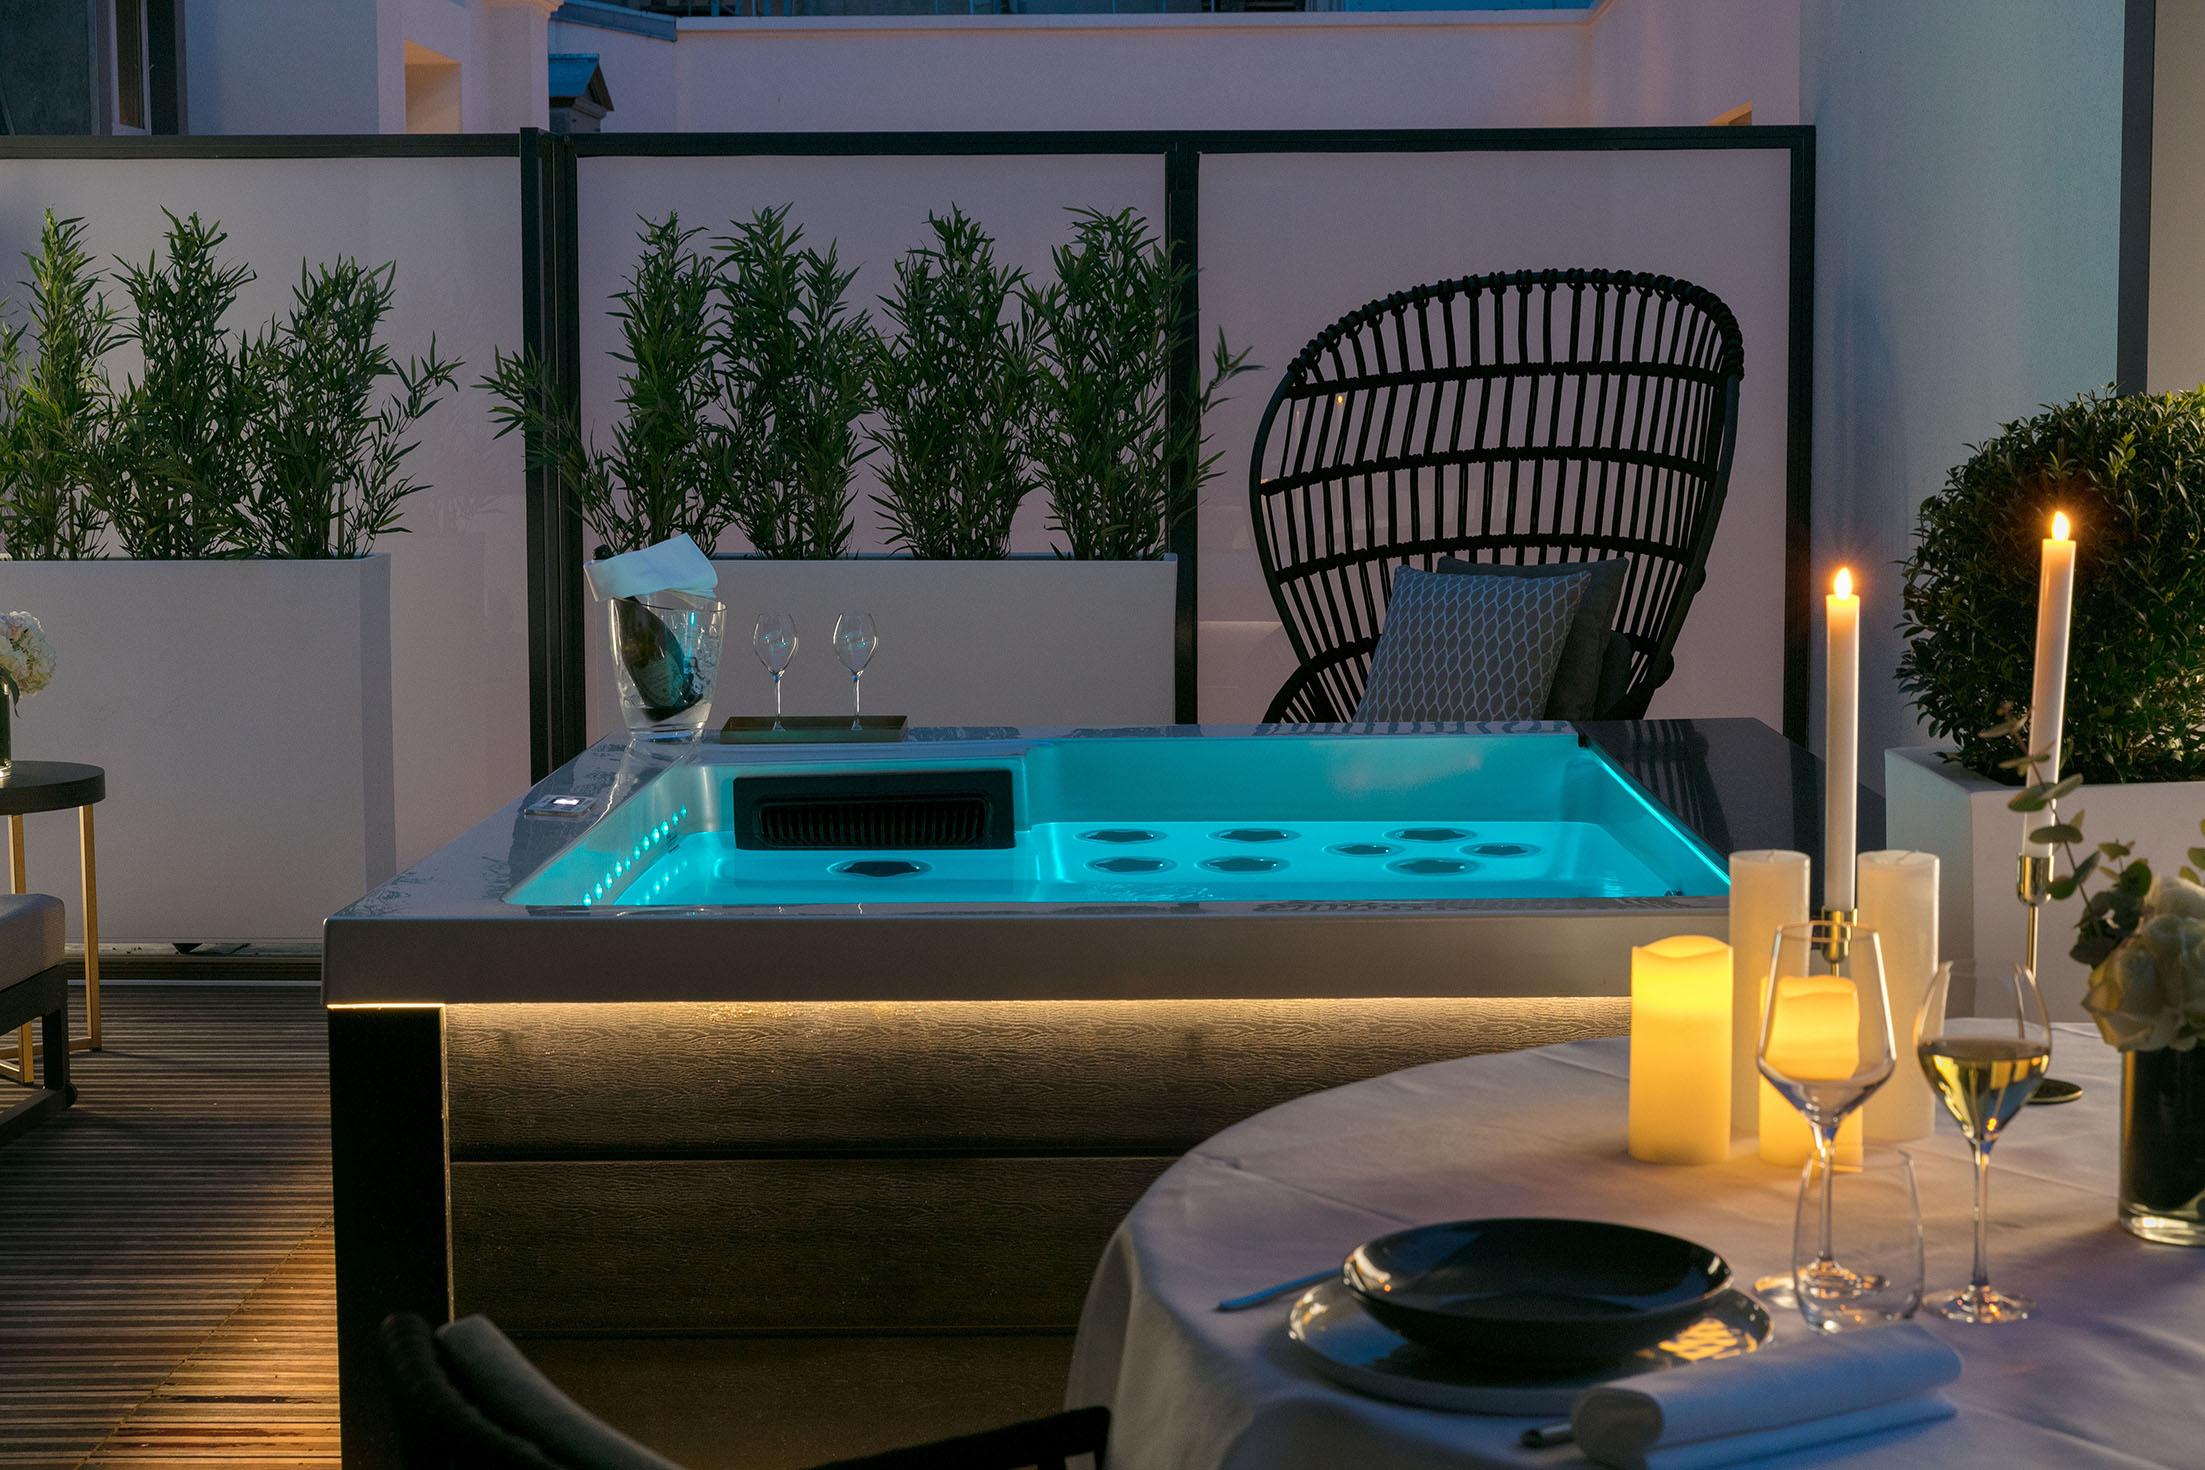 suite-niepce-terrasse-jacuzzi-nuit-01